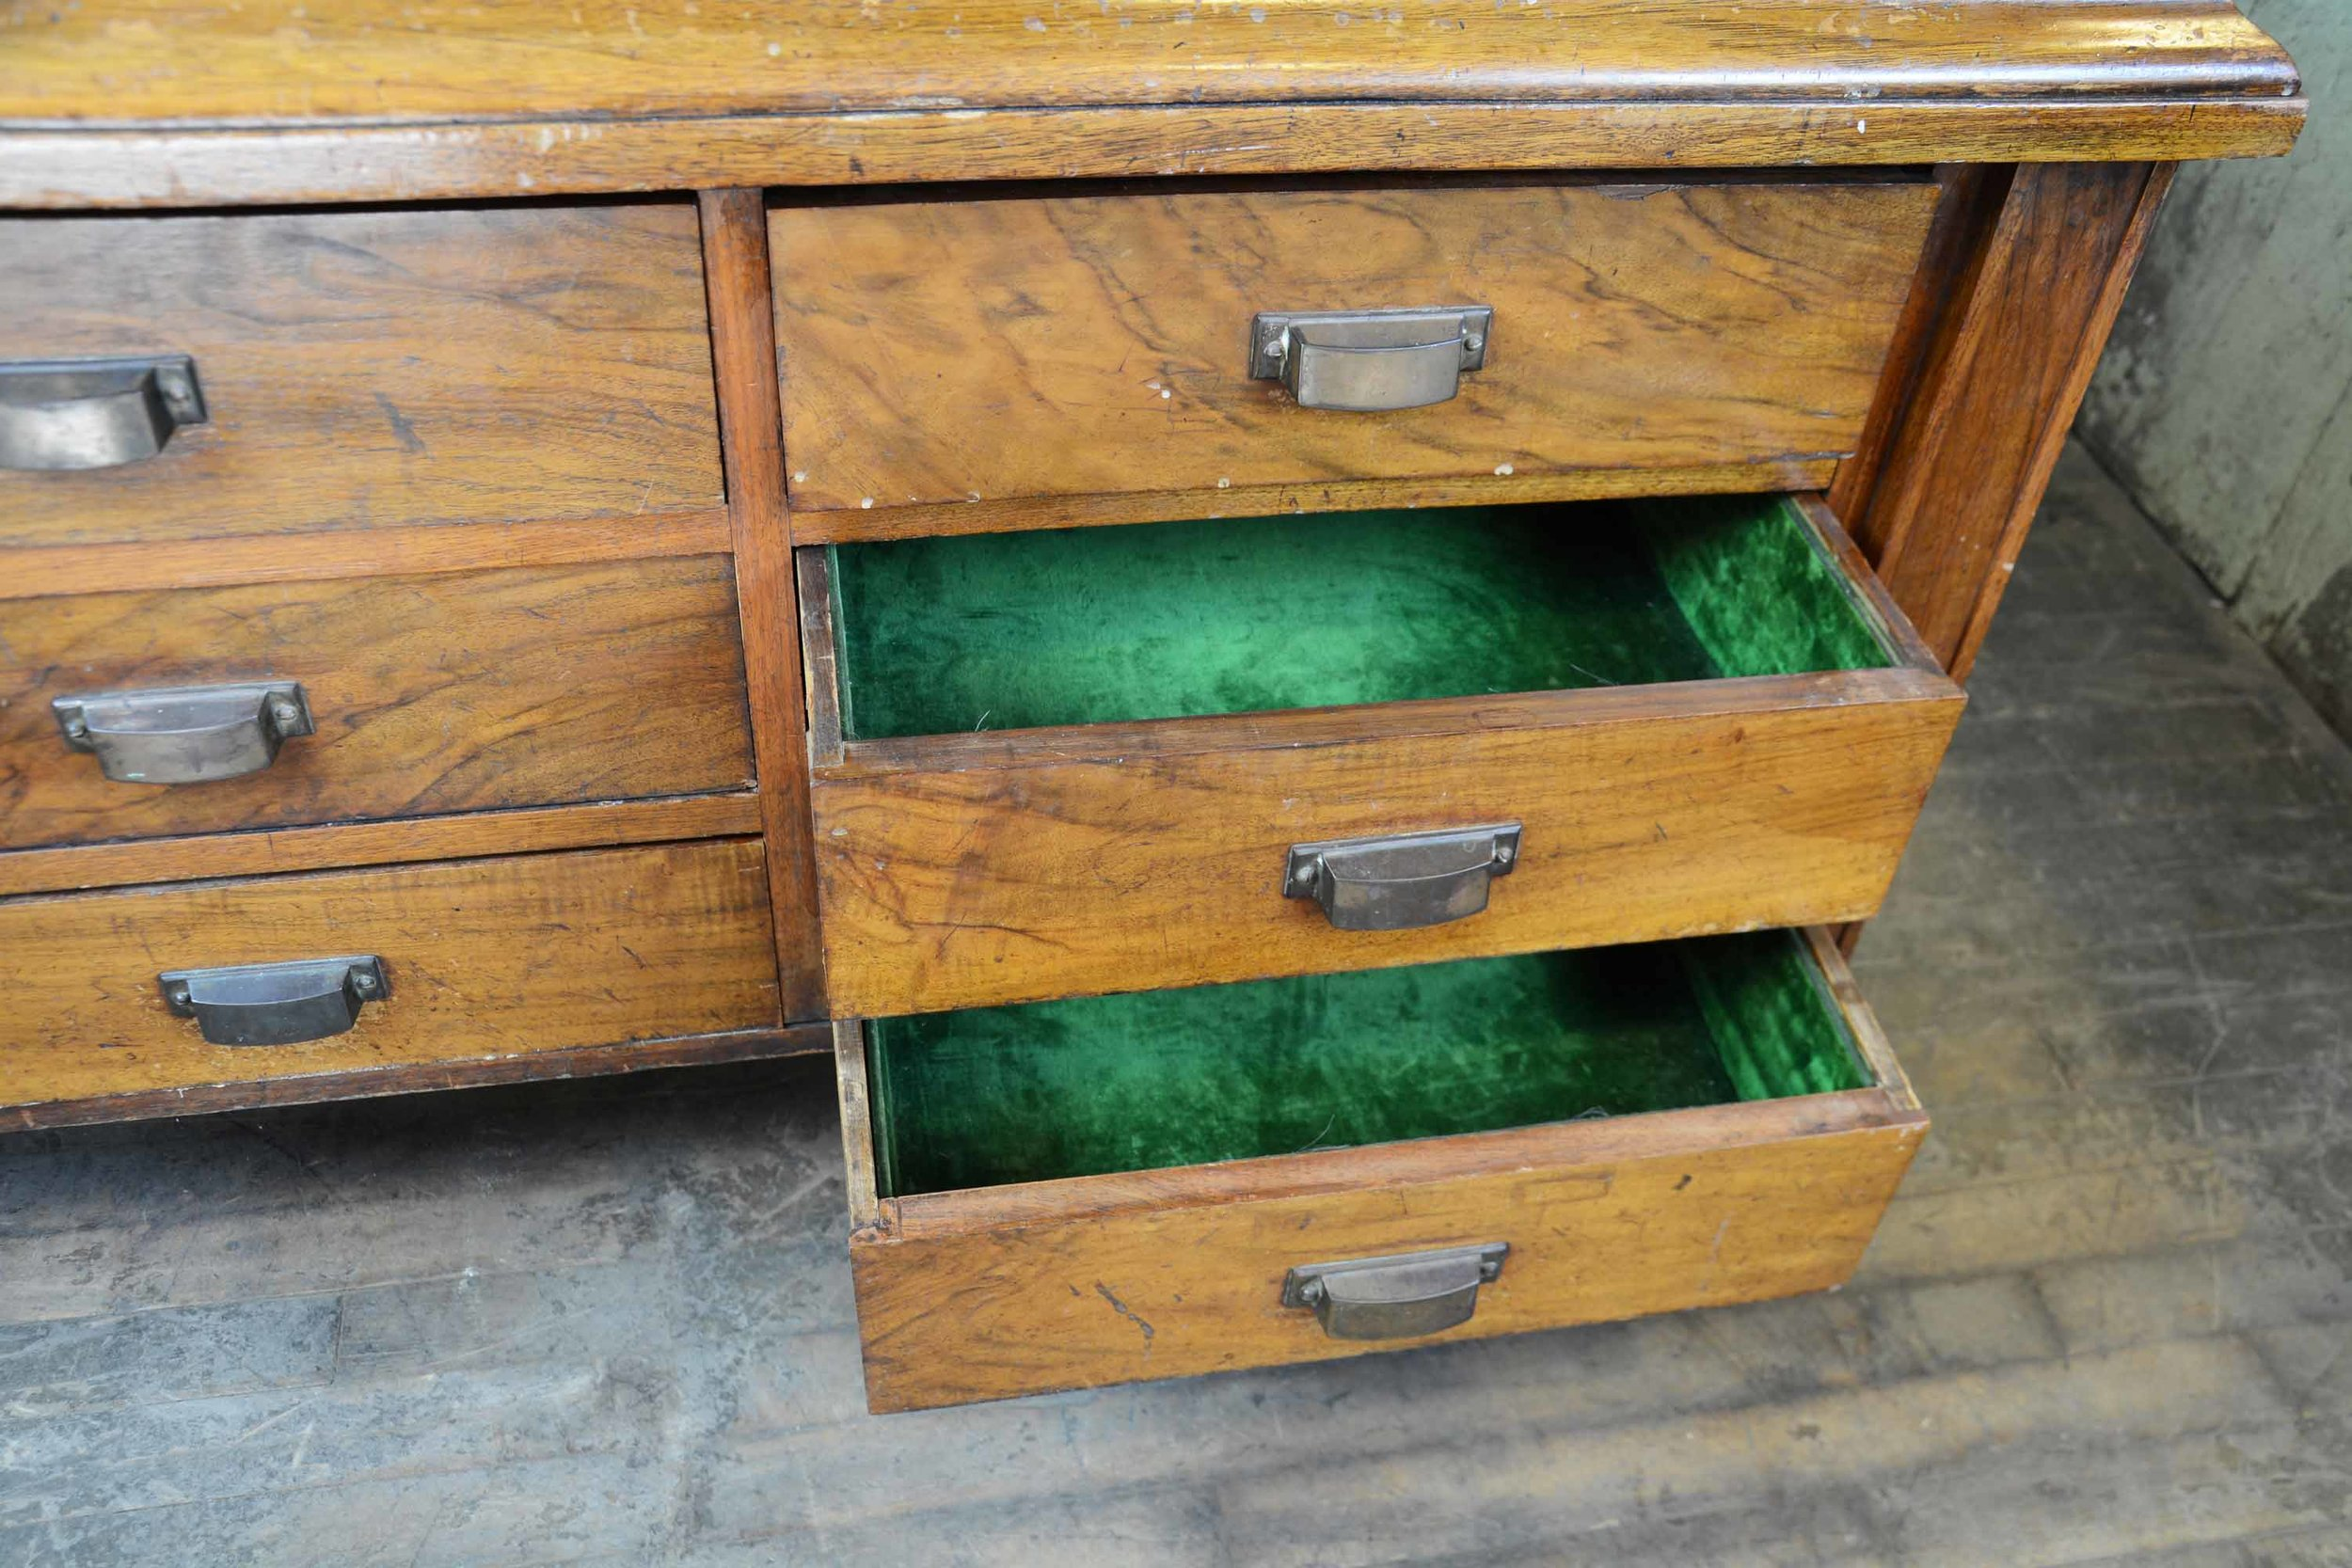 46917-display-case-with-drawers-DRAWER-DETAIL.jpg